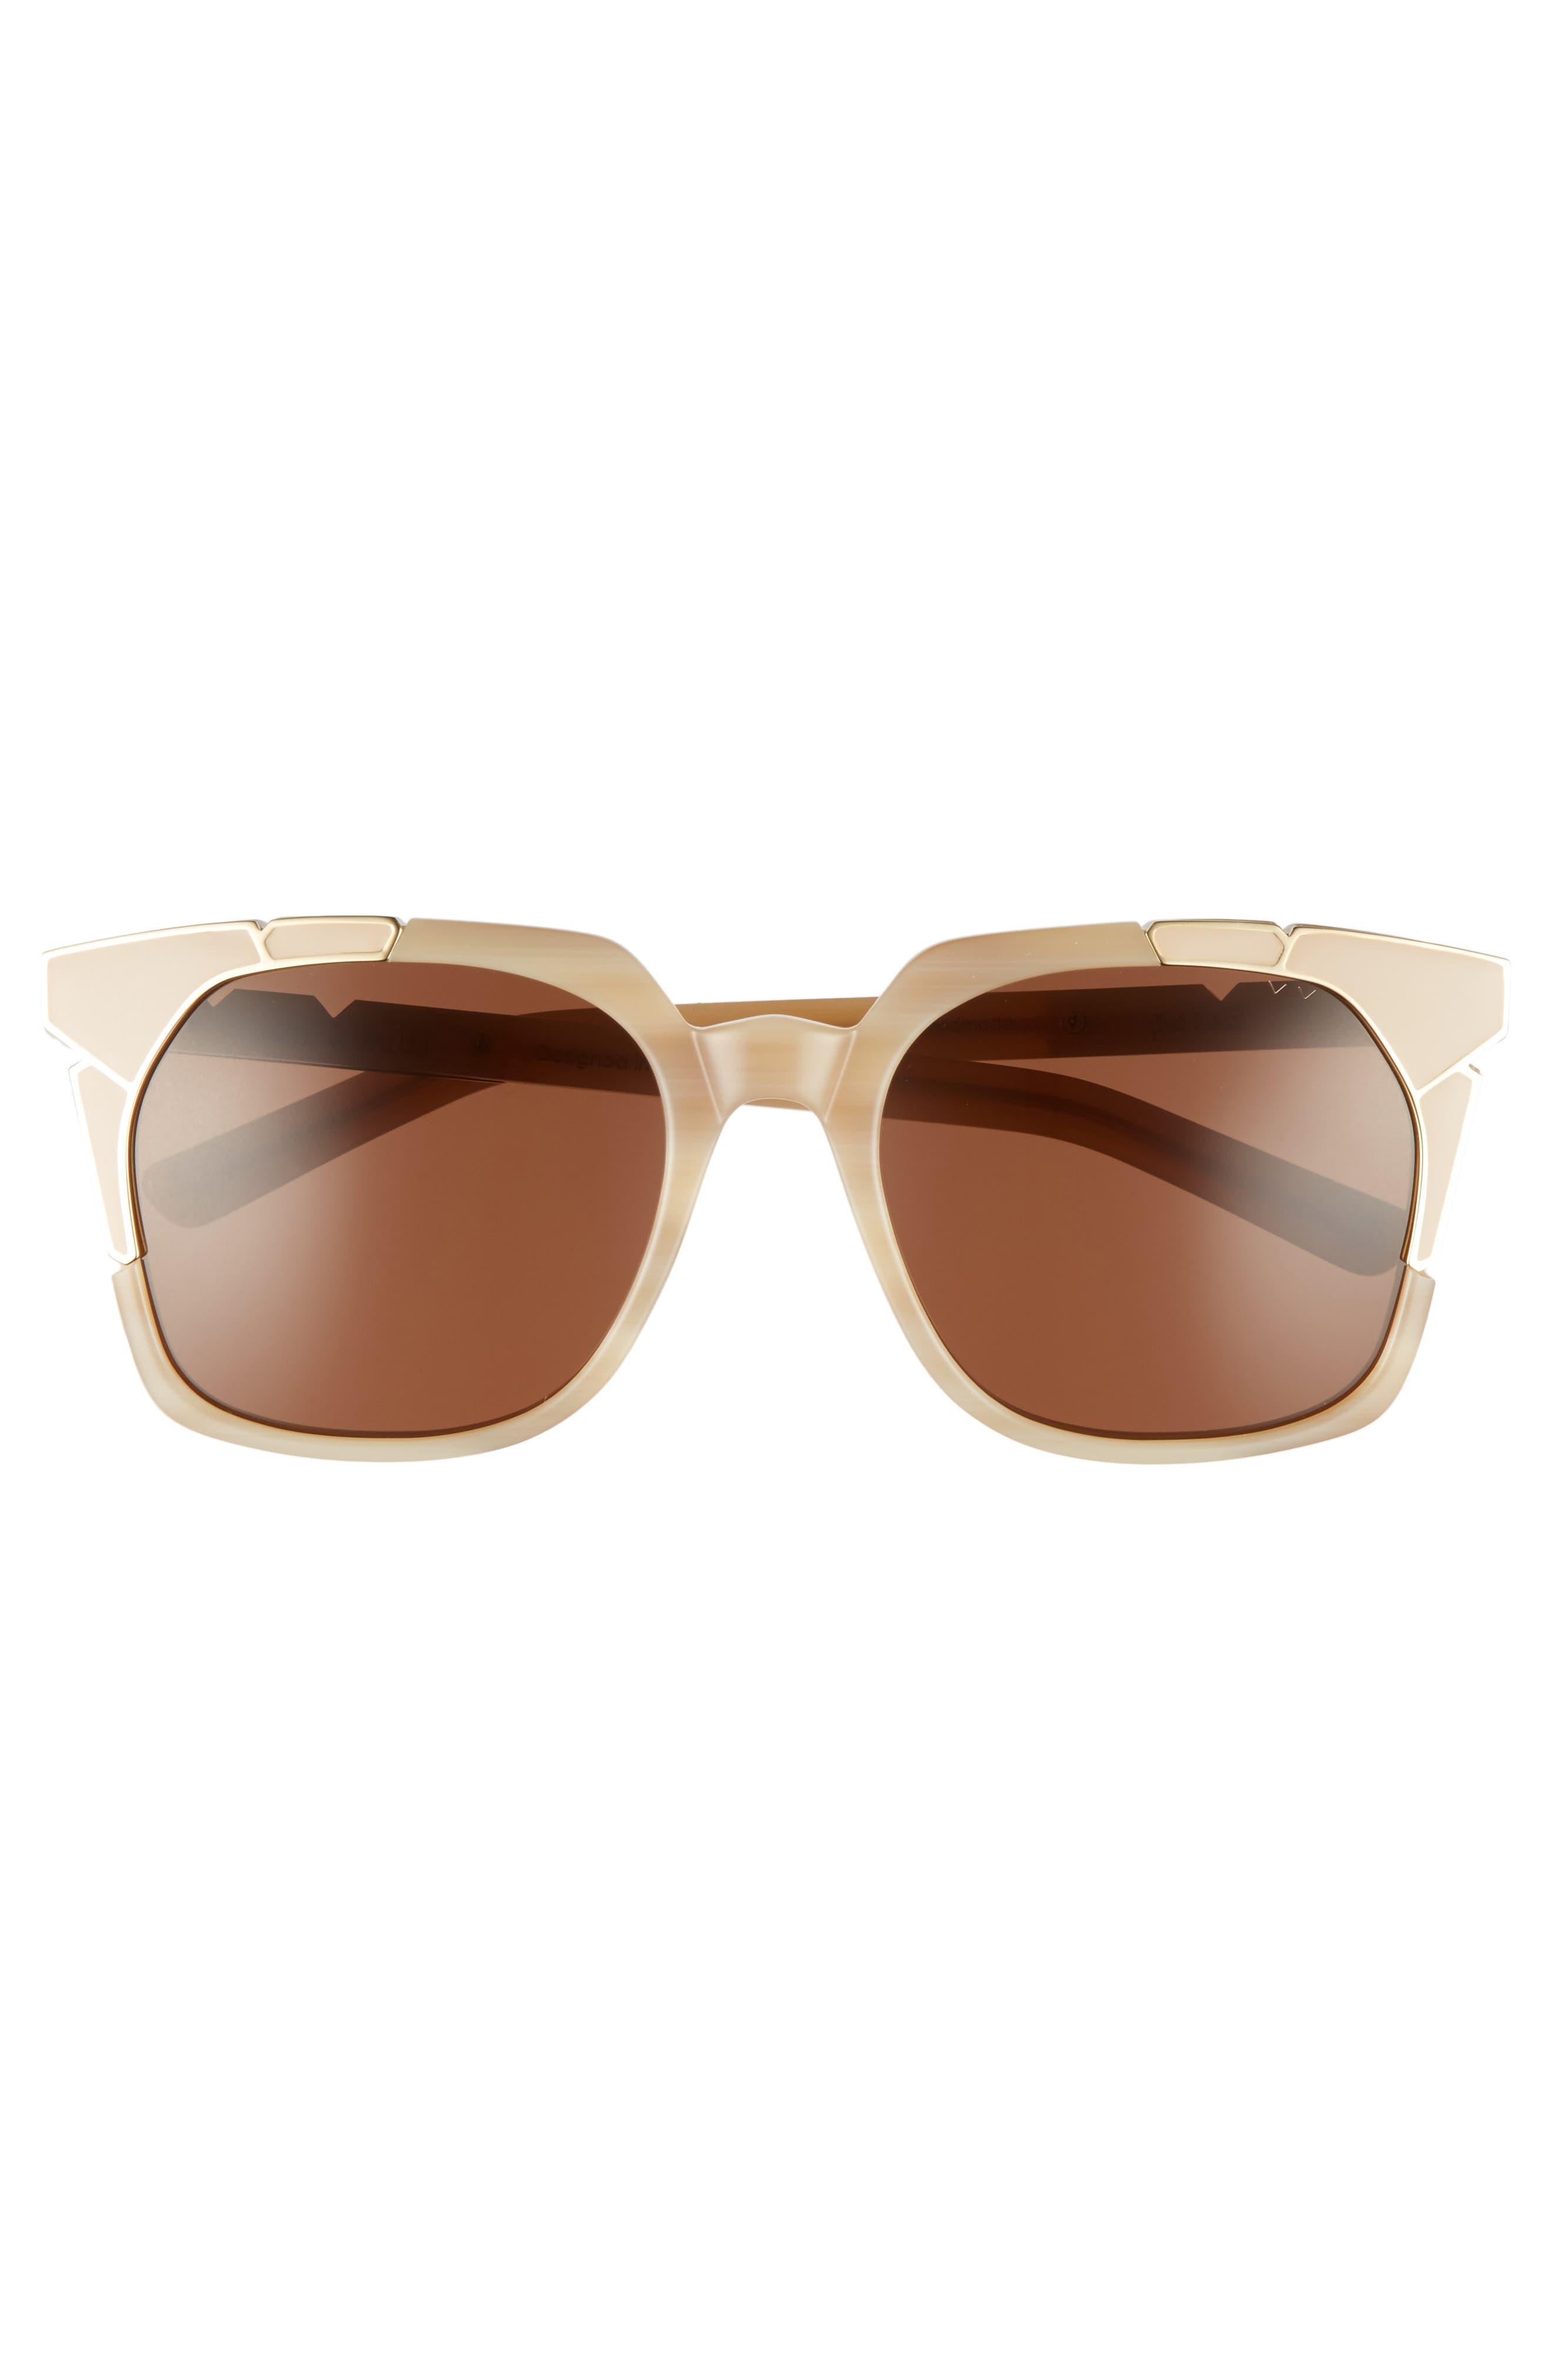 Alternate Image 3  - Pared Tutti & Frutti 55mm Sunglasses